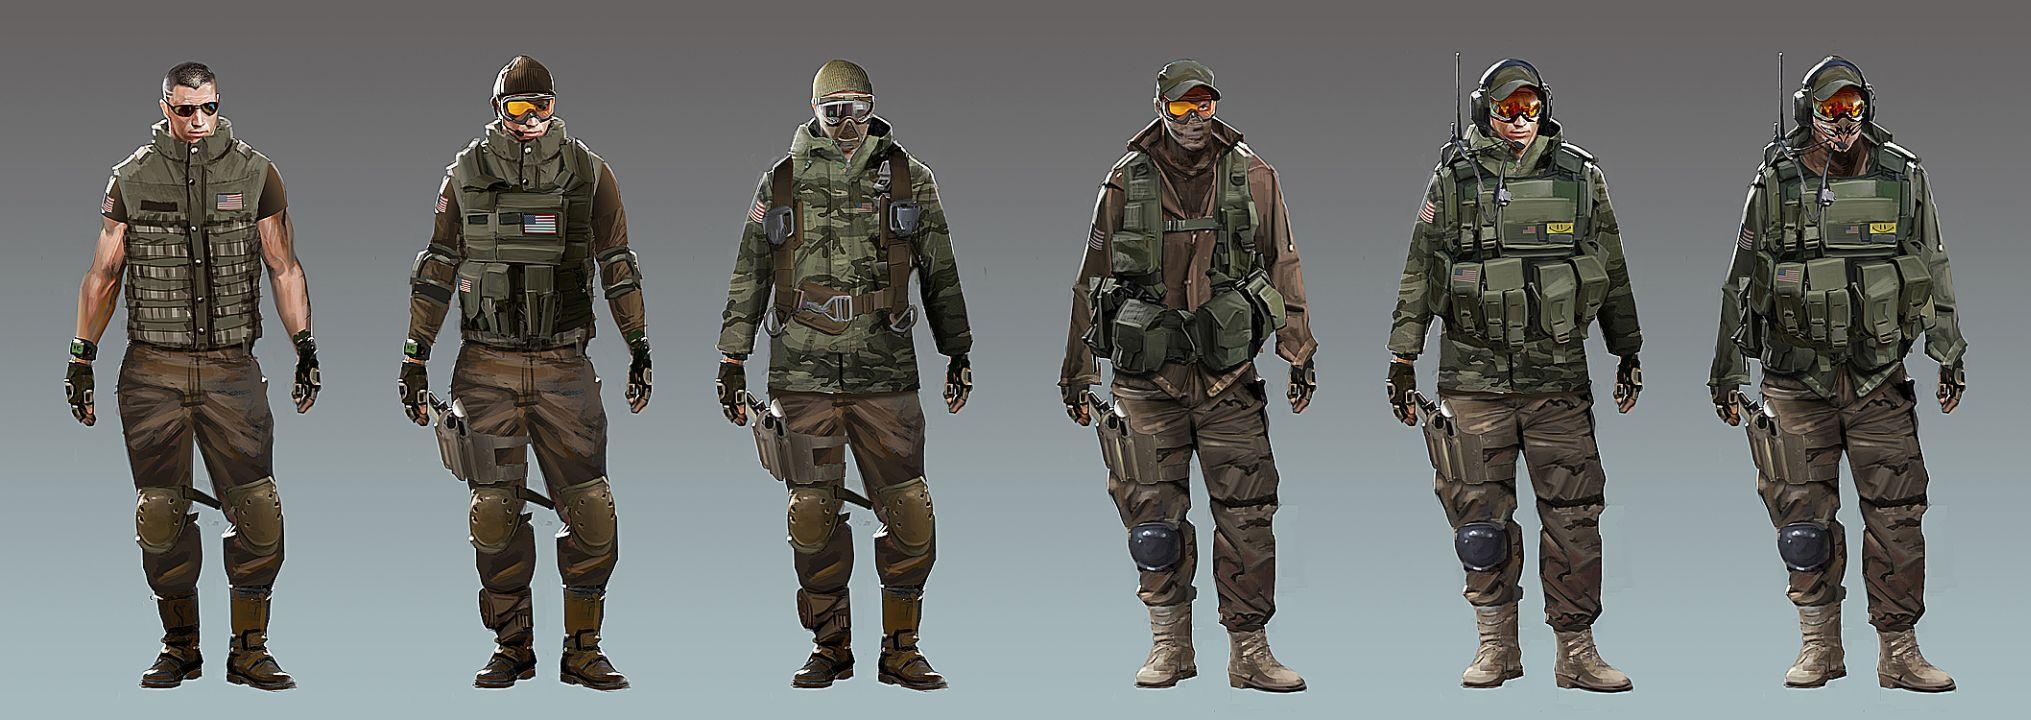 Солдаты США (Аляска) - Modern Combat 3: Fallen Nation Арт